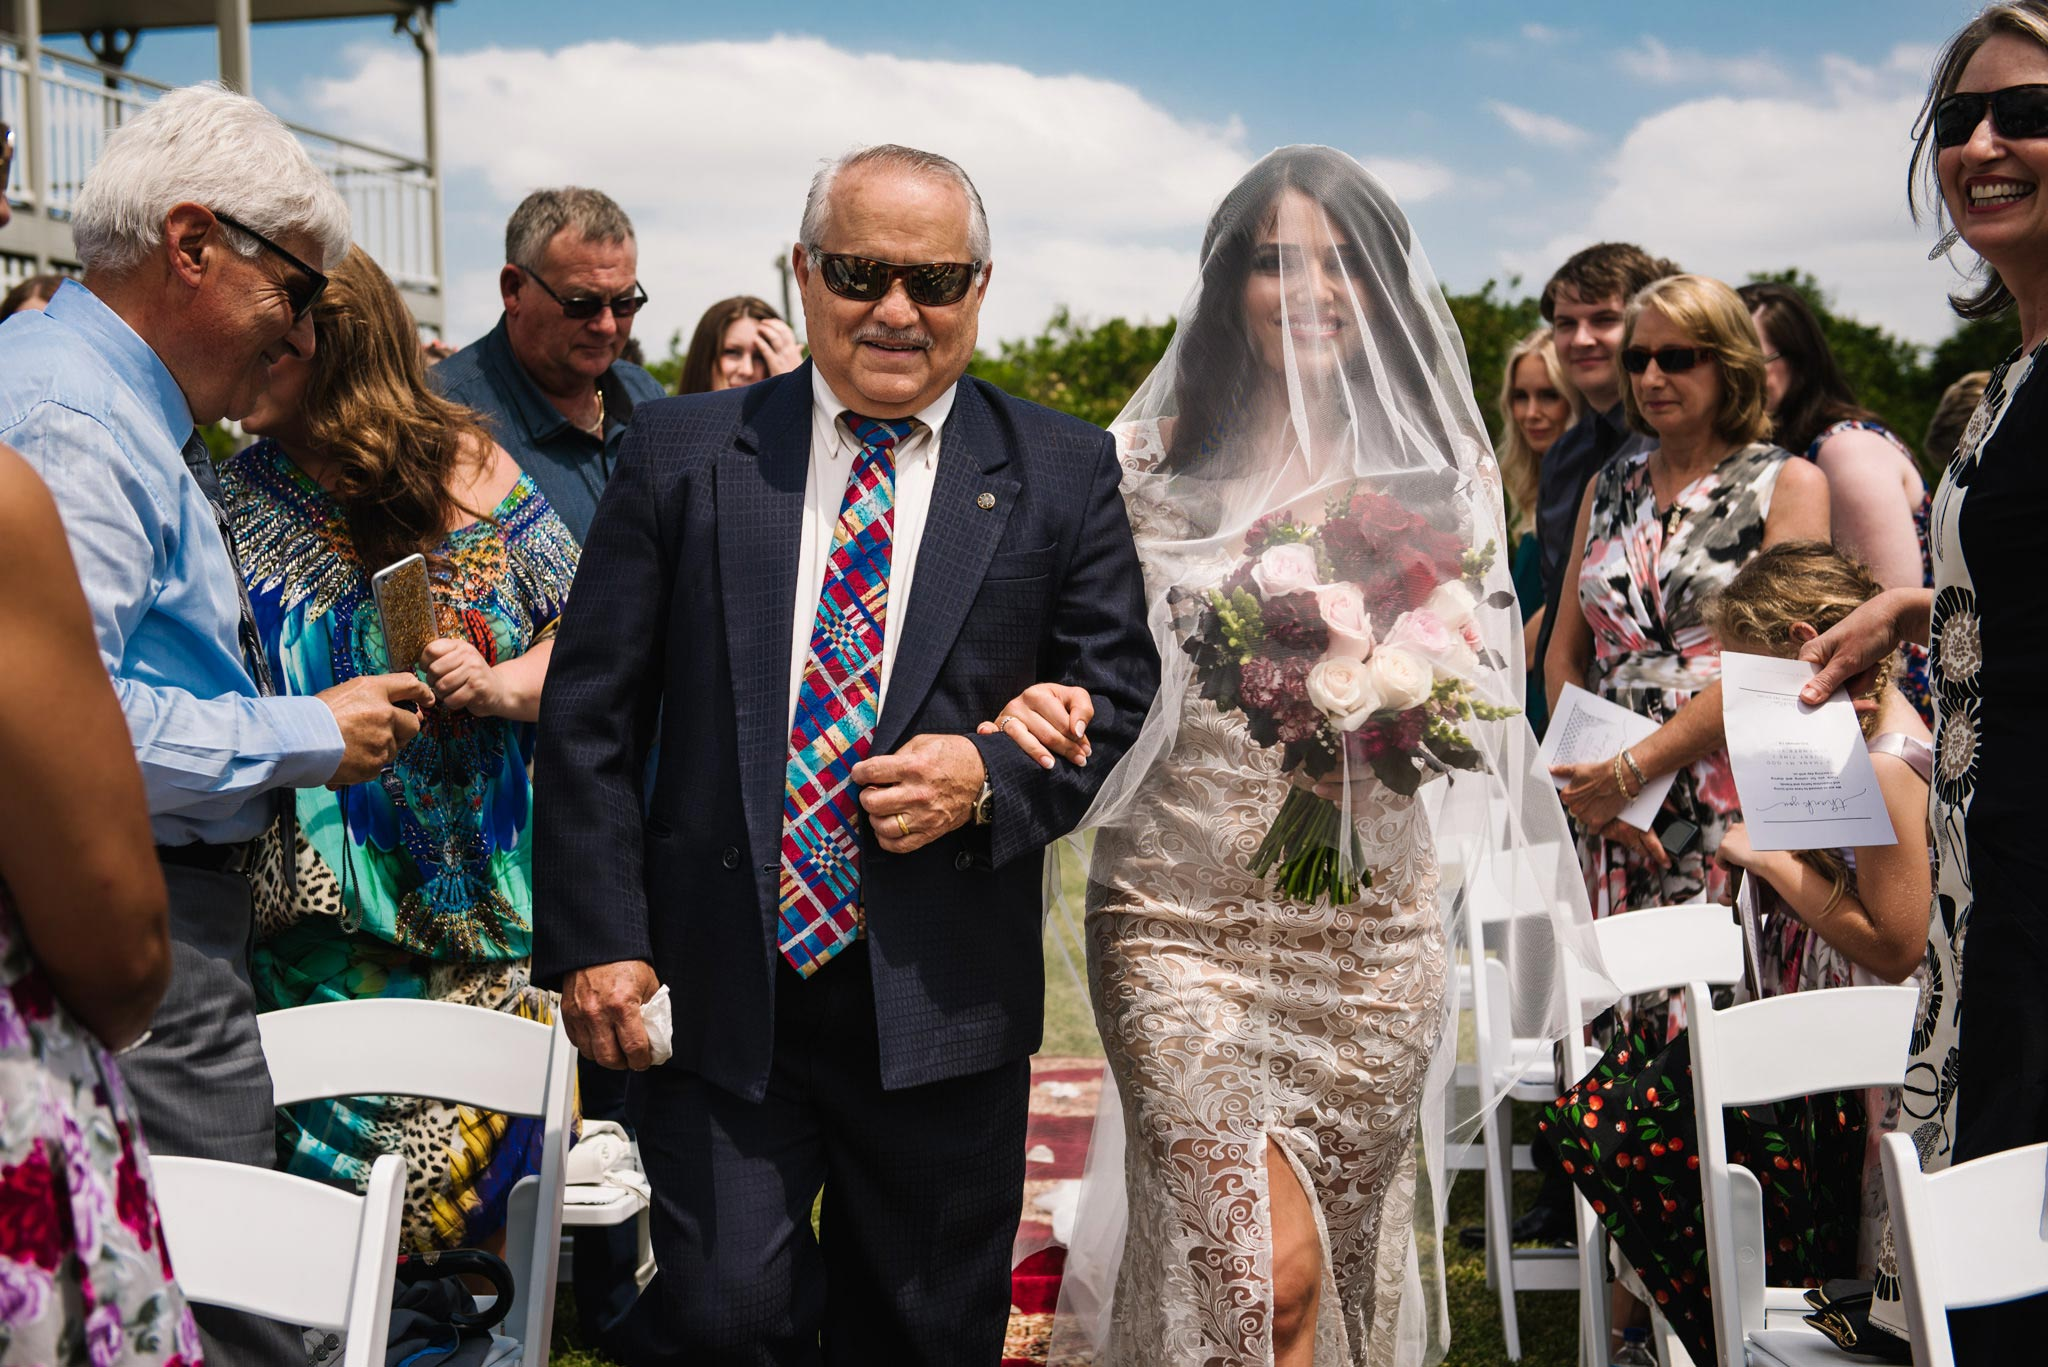 Cornwallis-House-wedding-bride-walking-down-the-aisle.jpg